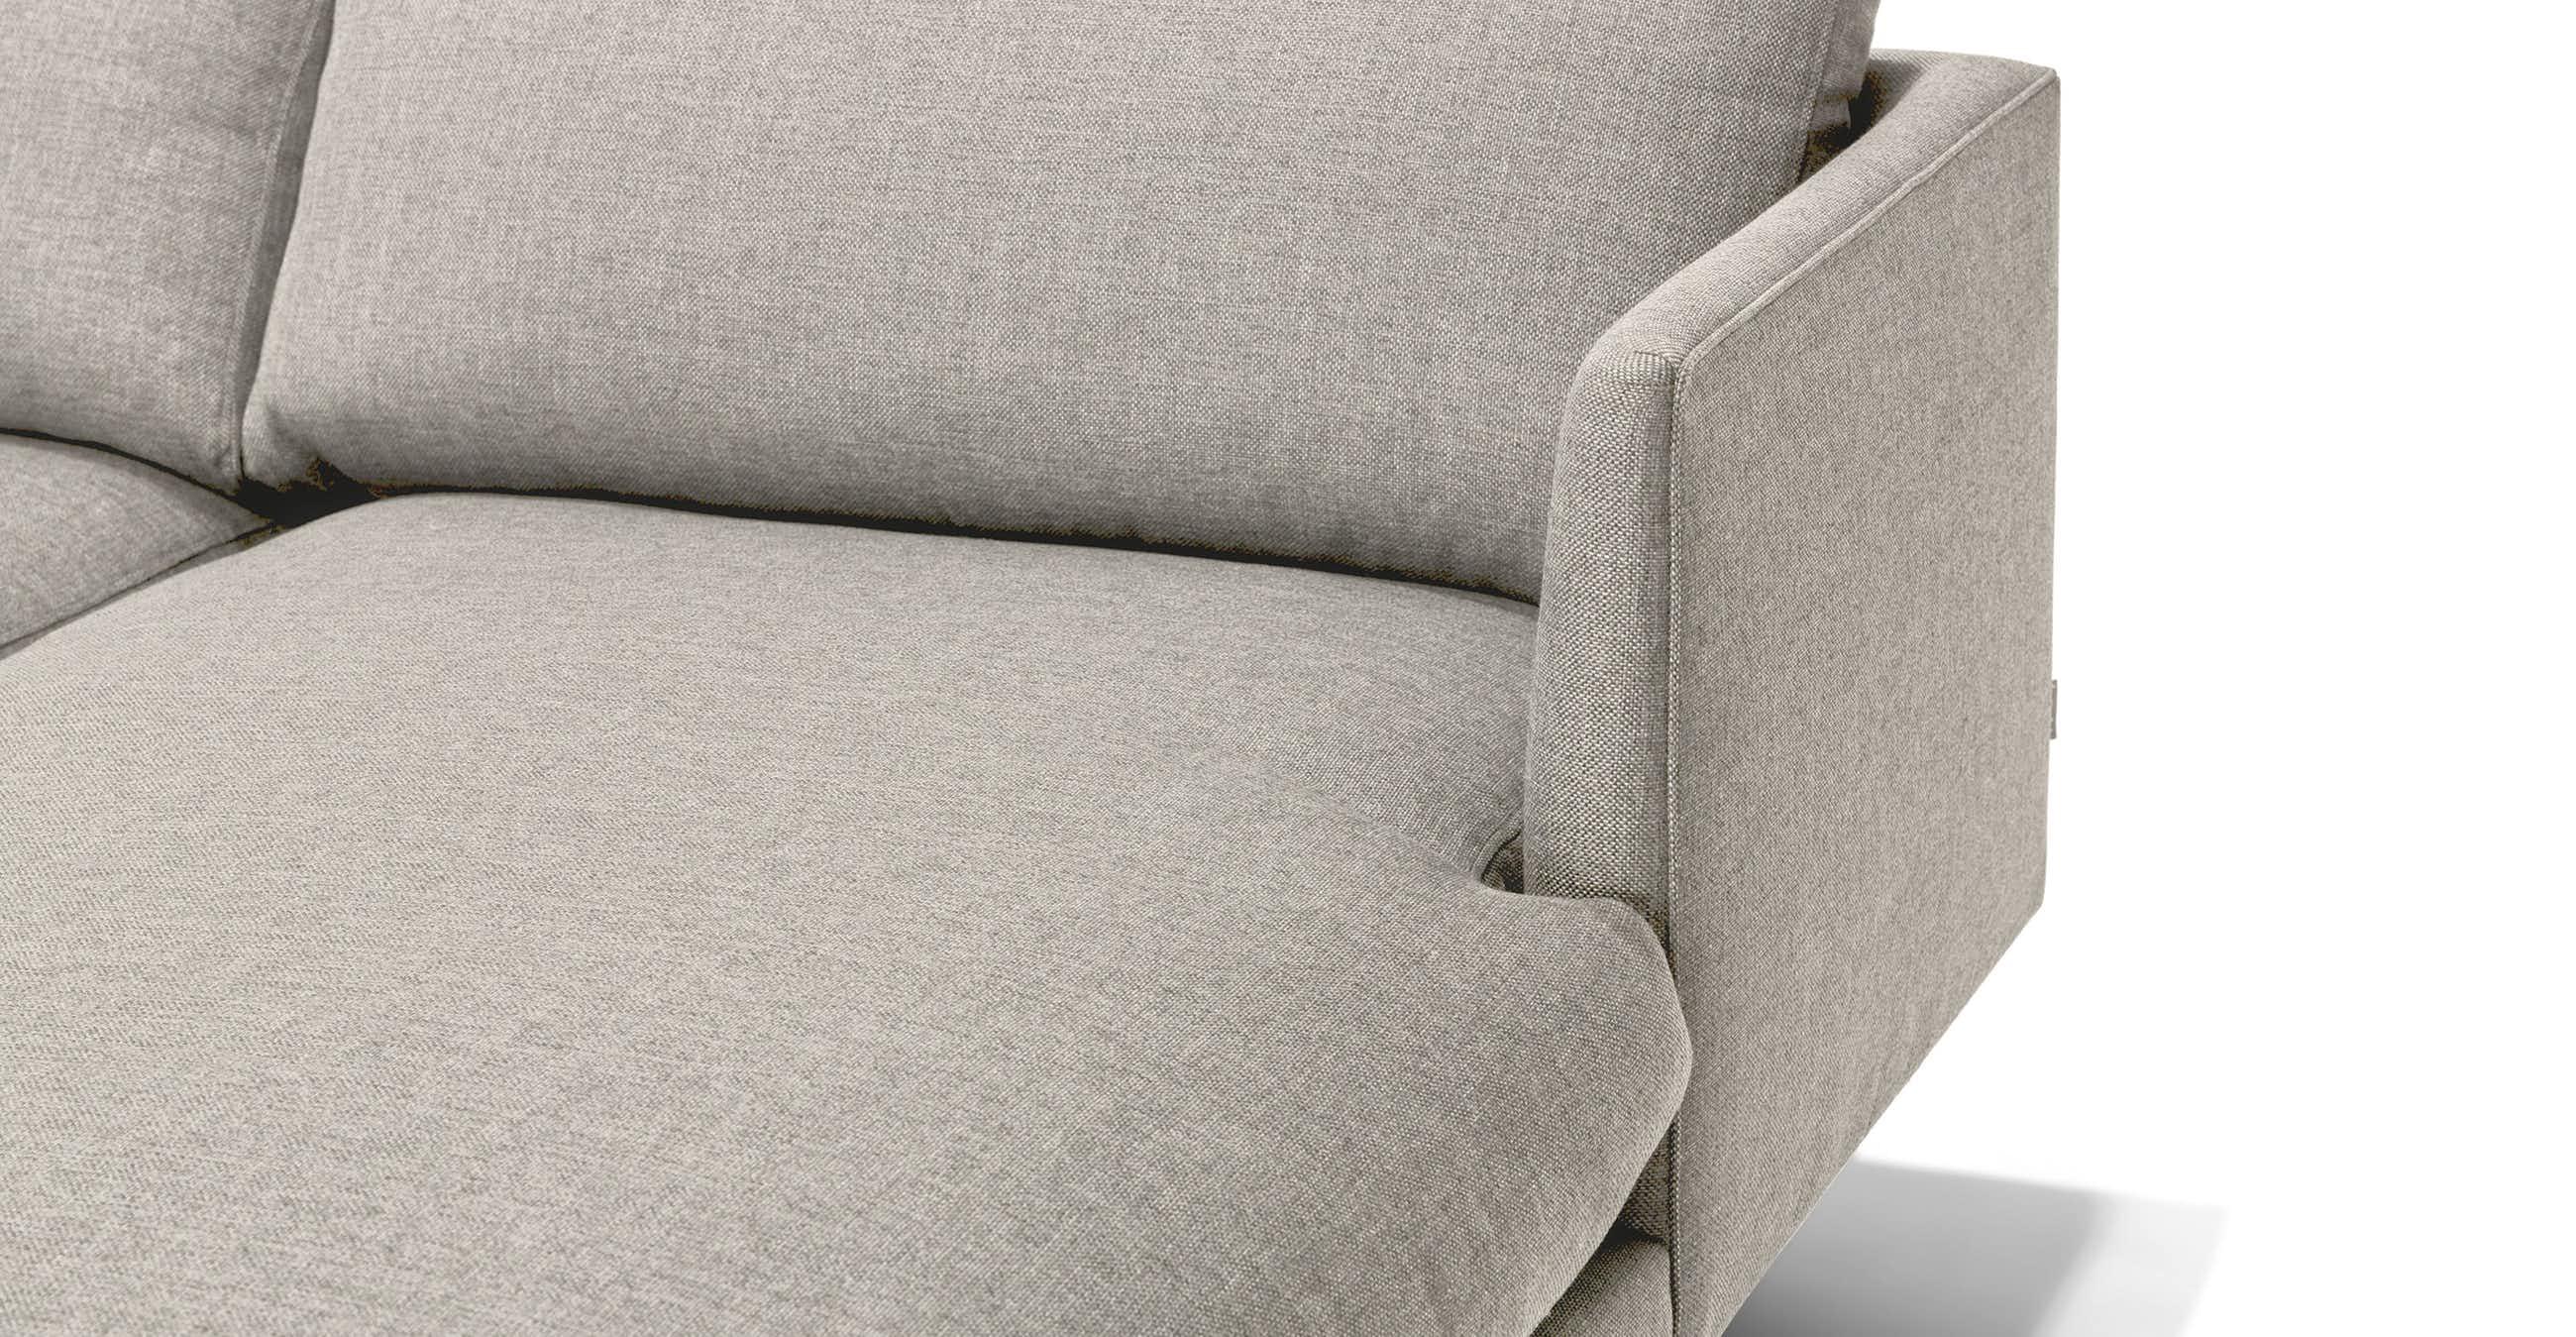 Burrard Seasalt Gray Right Sectional Sofa